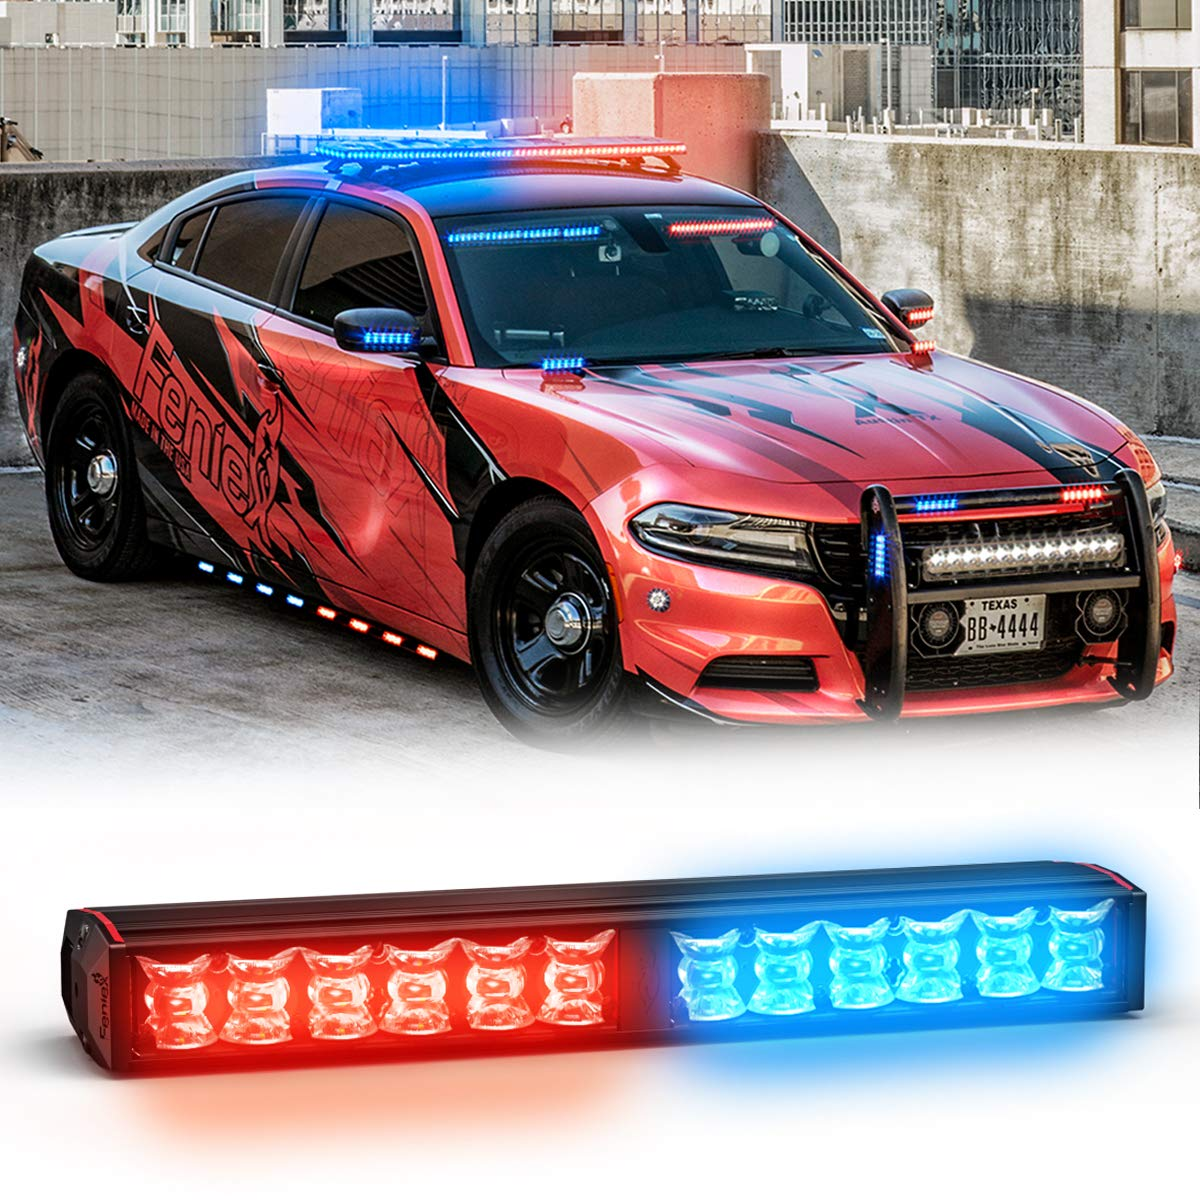 Feniex Fusion 200 Stick Light Single Color Red//Blue, 180/°